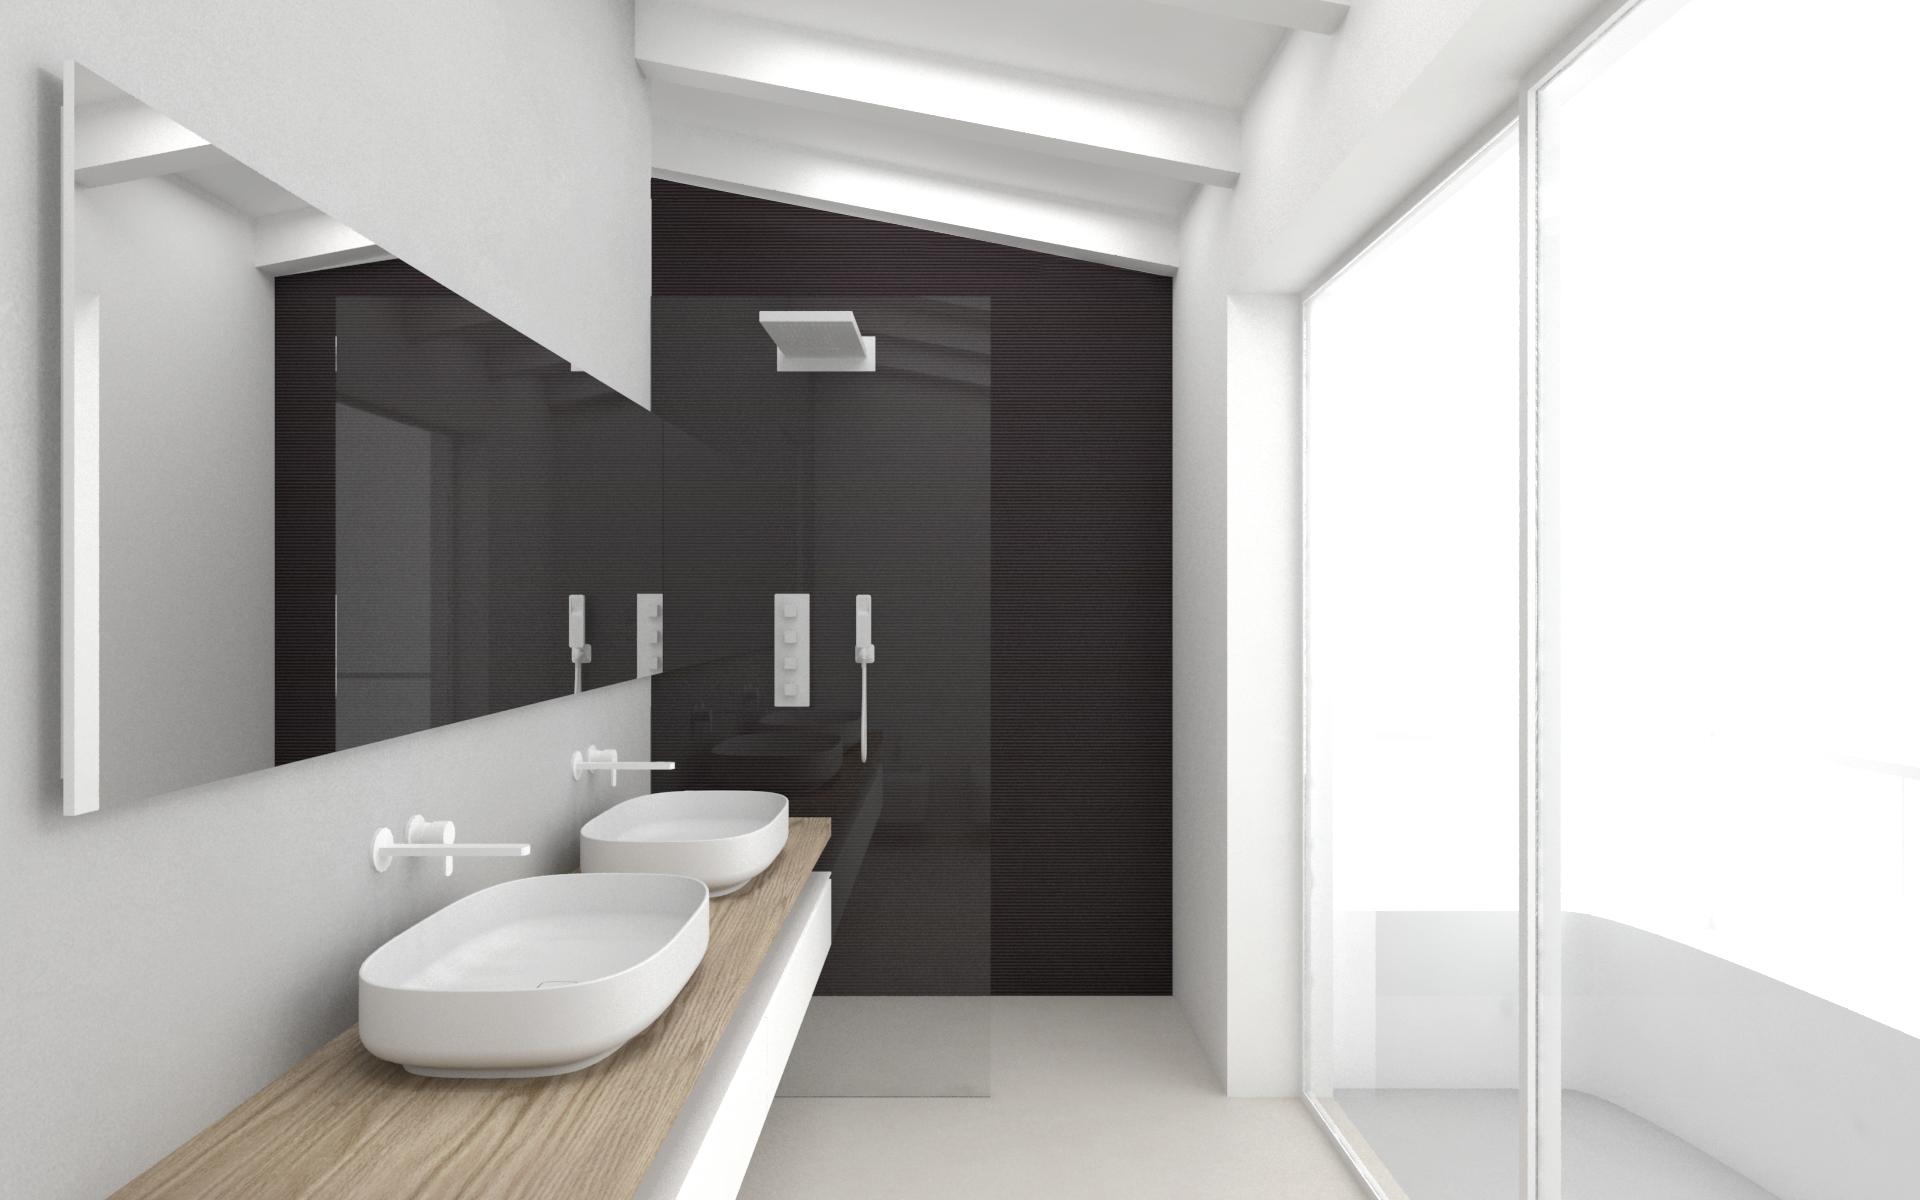 Casa-MR-_-DFG-Architetti-Associati-7